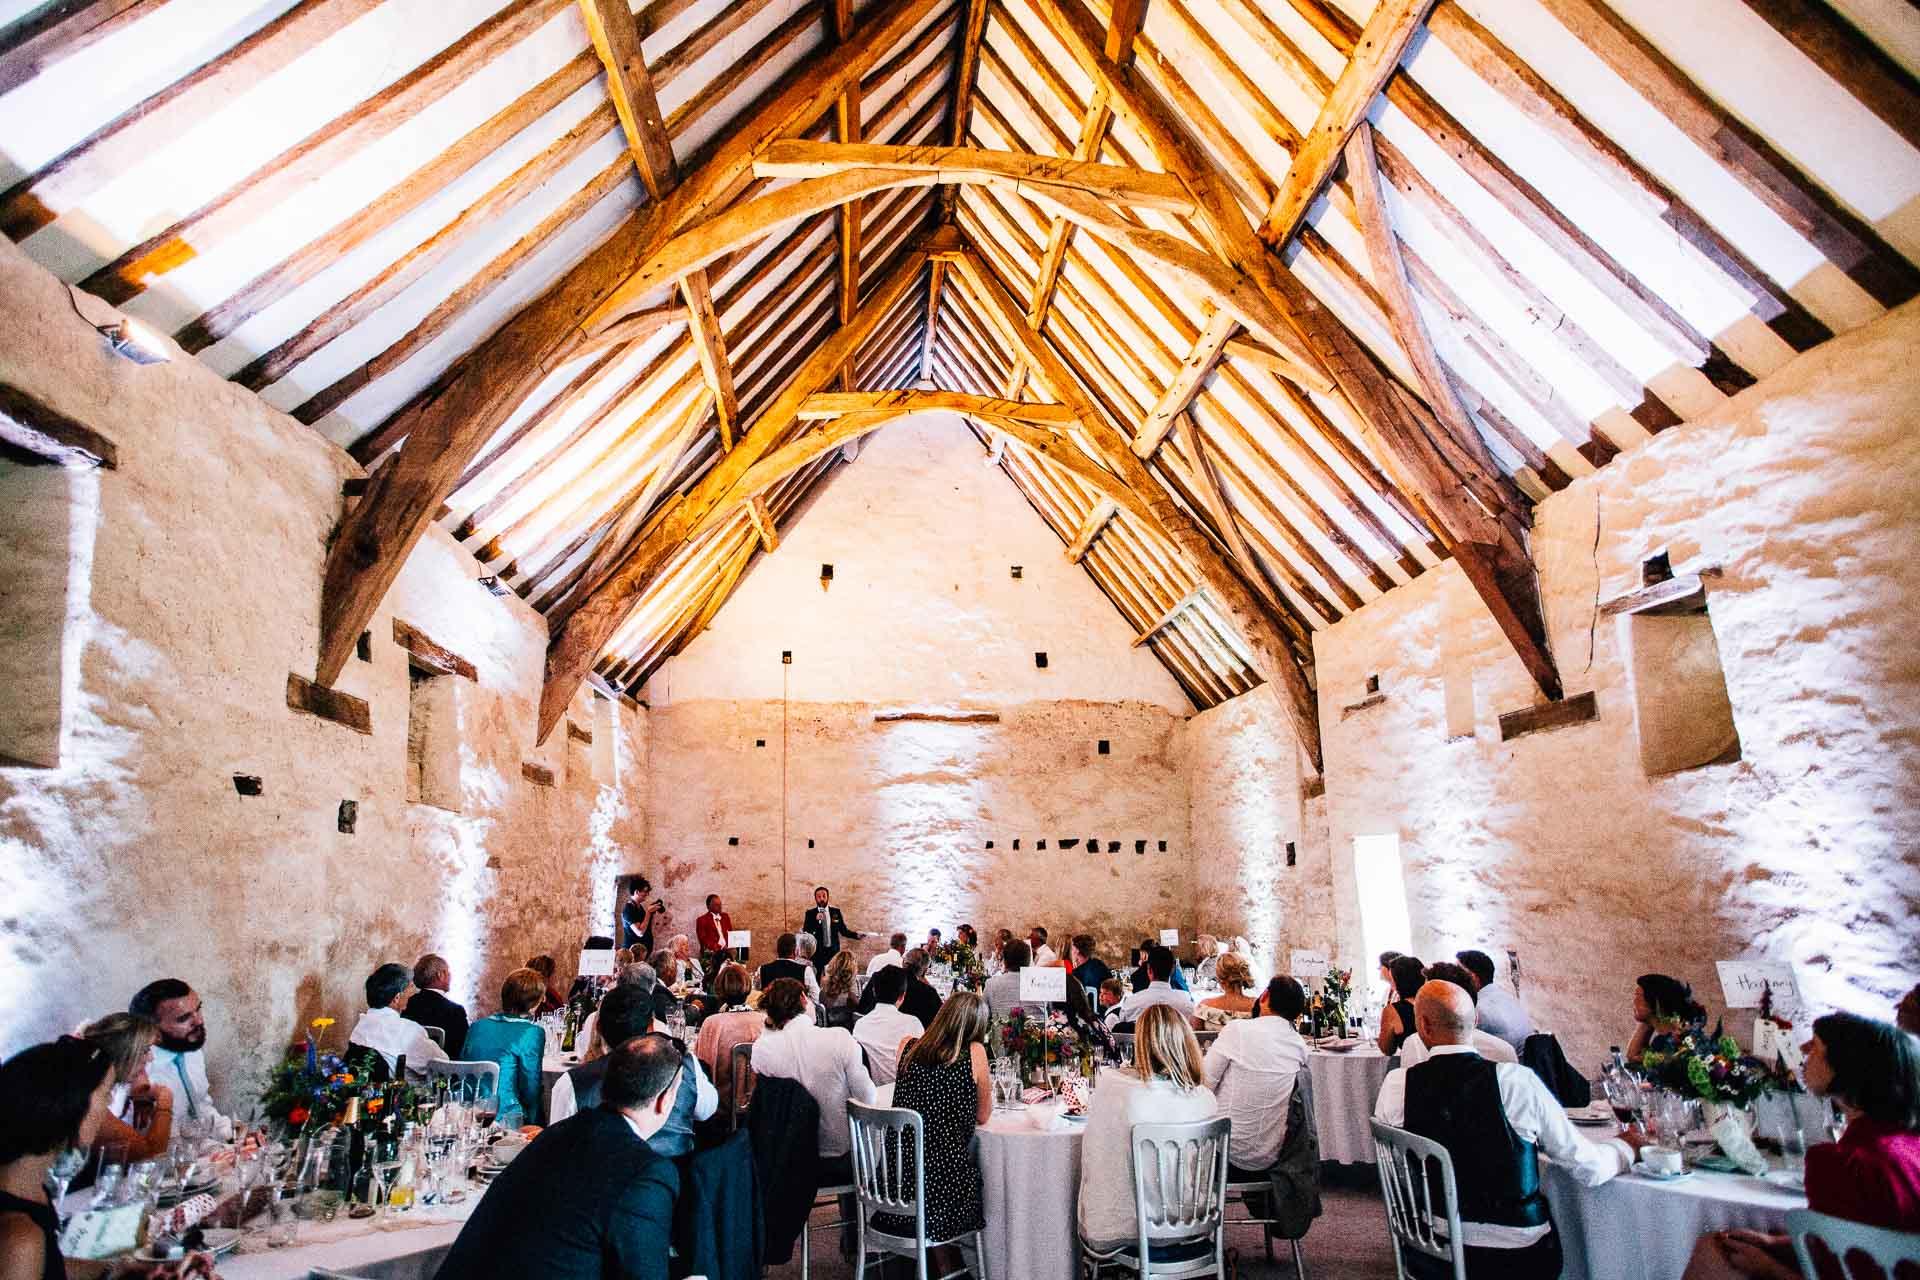 winterbourne-medieval-barn-wedding-photography-emma-andrew-104